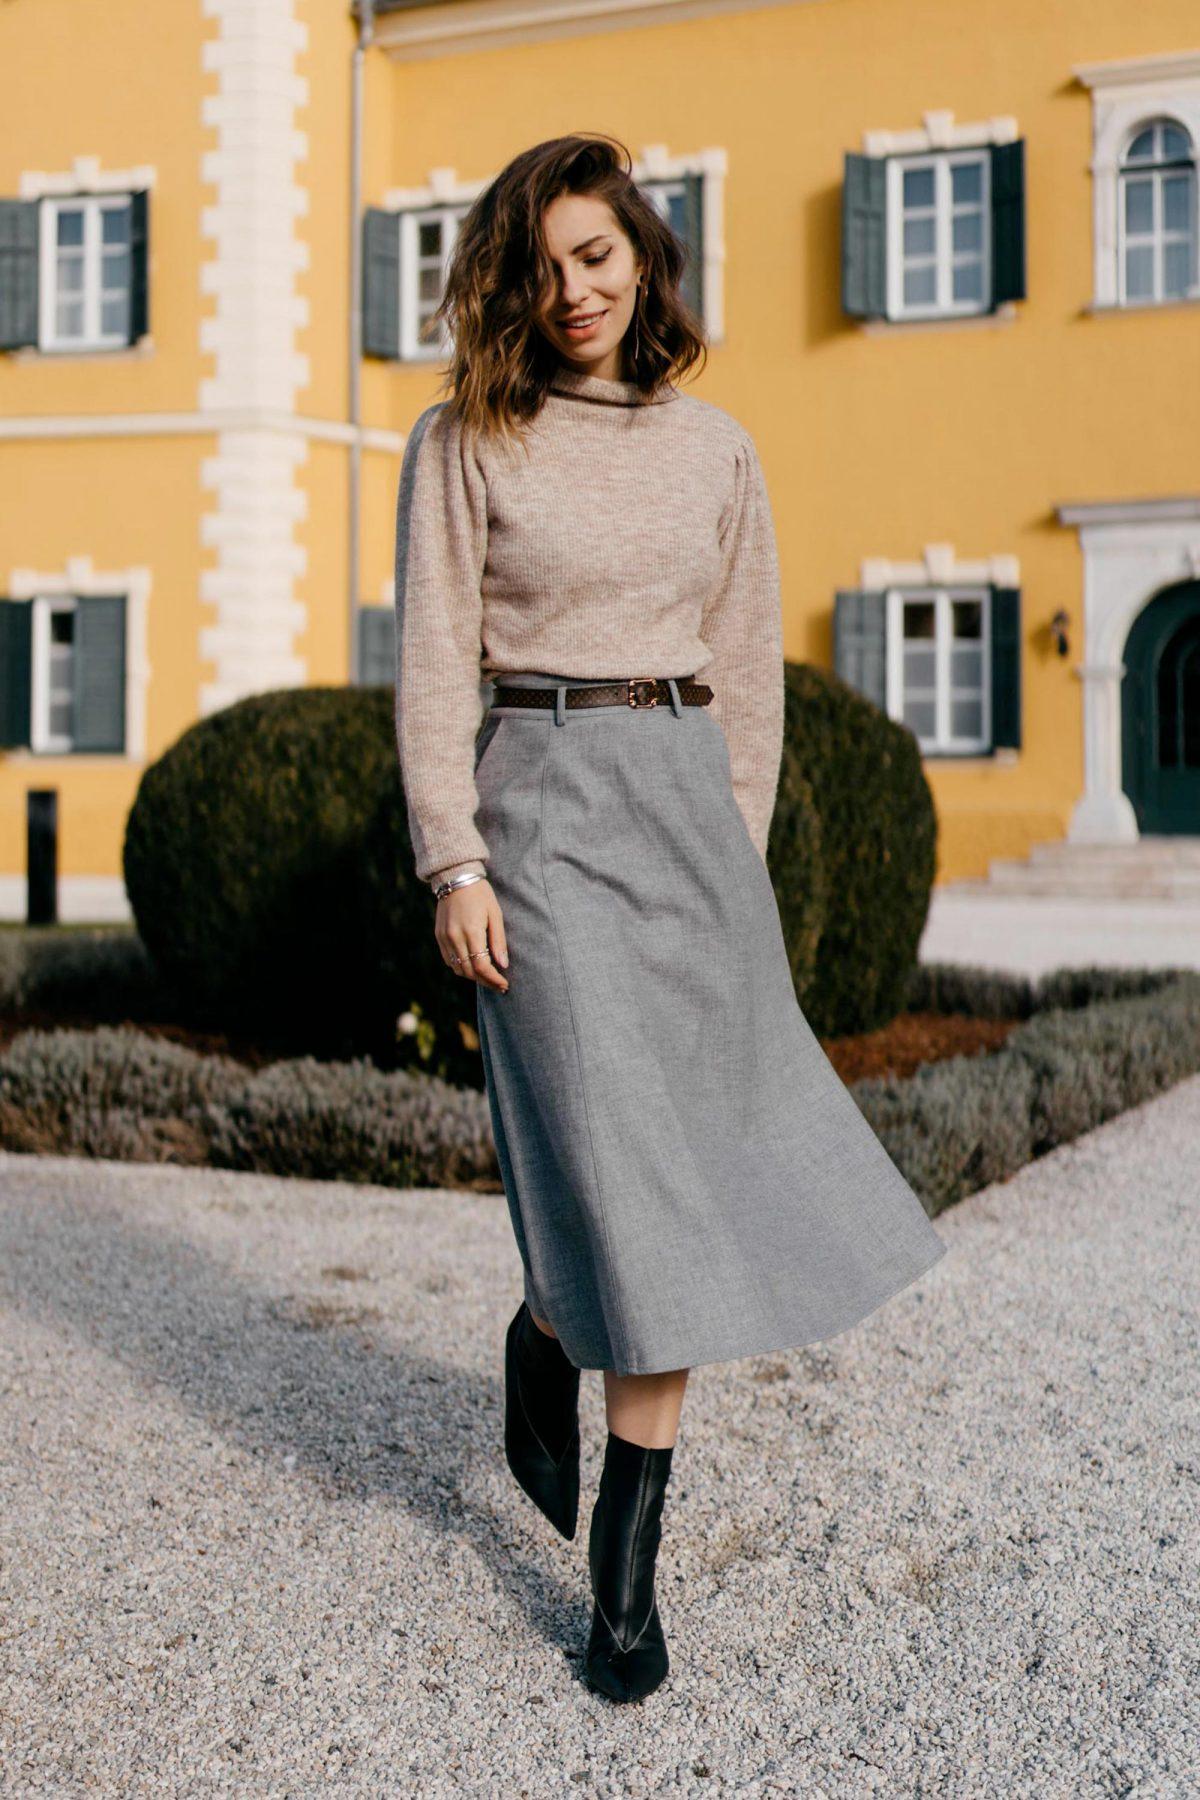 The A-Line Skirt